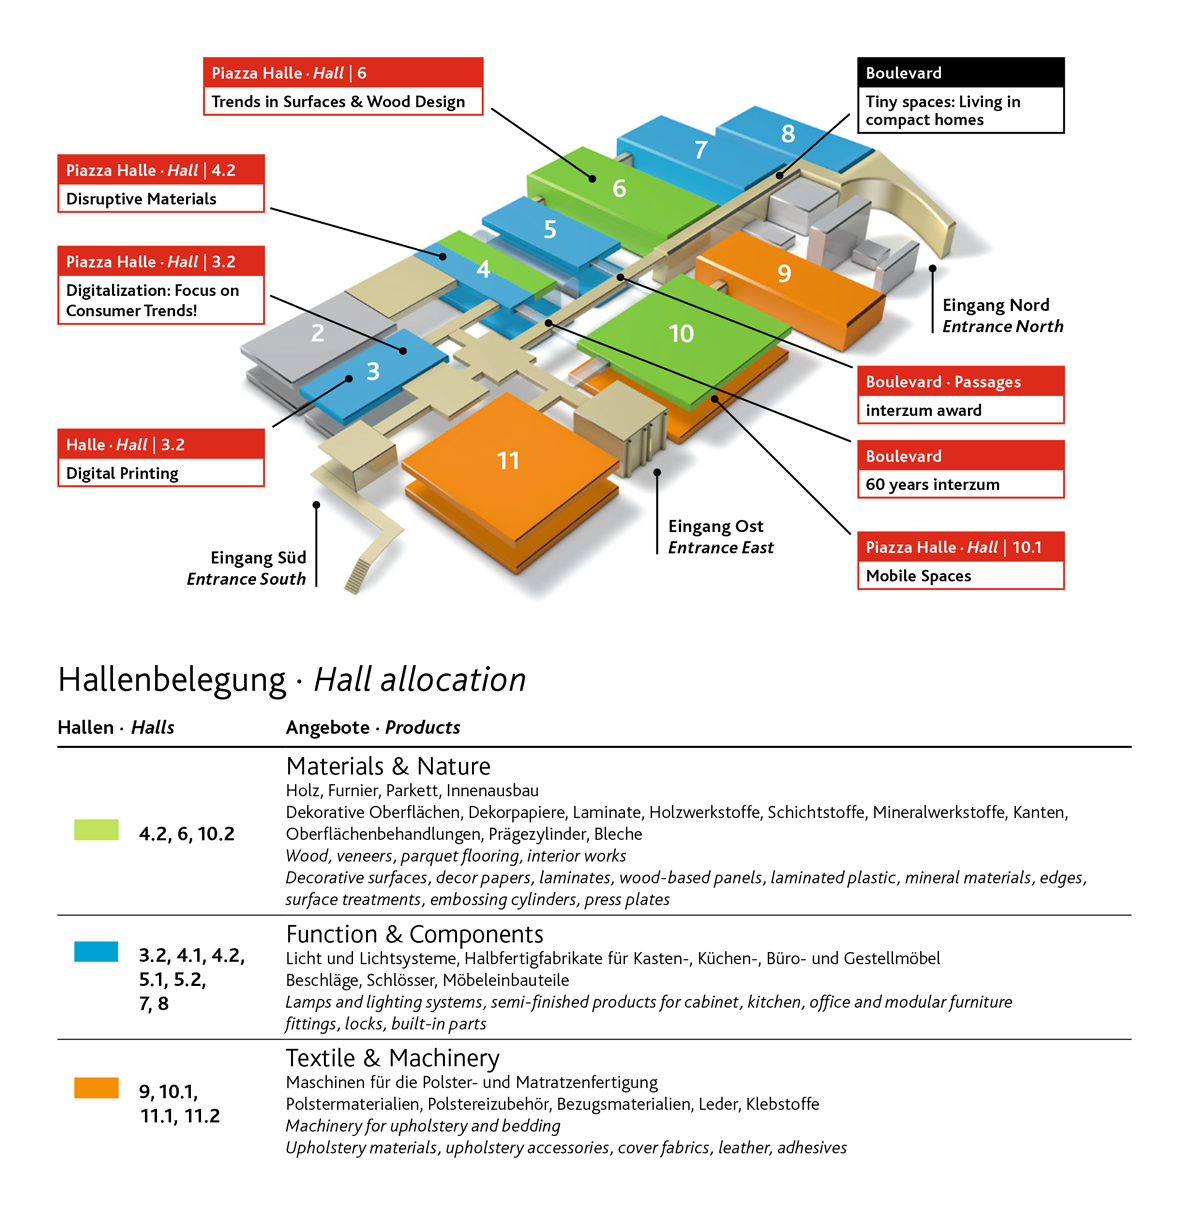 hallenbelegung_angebot_hallplan_themes-(1).png